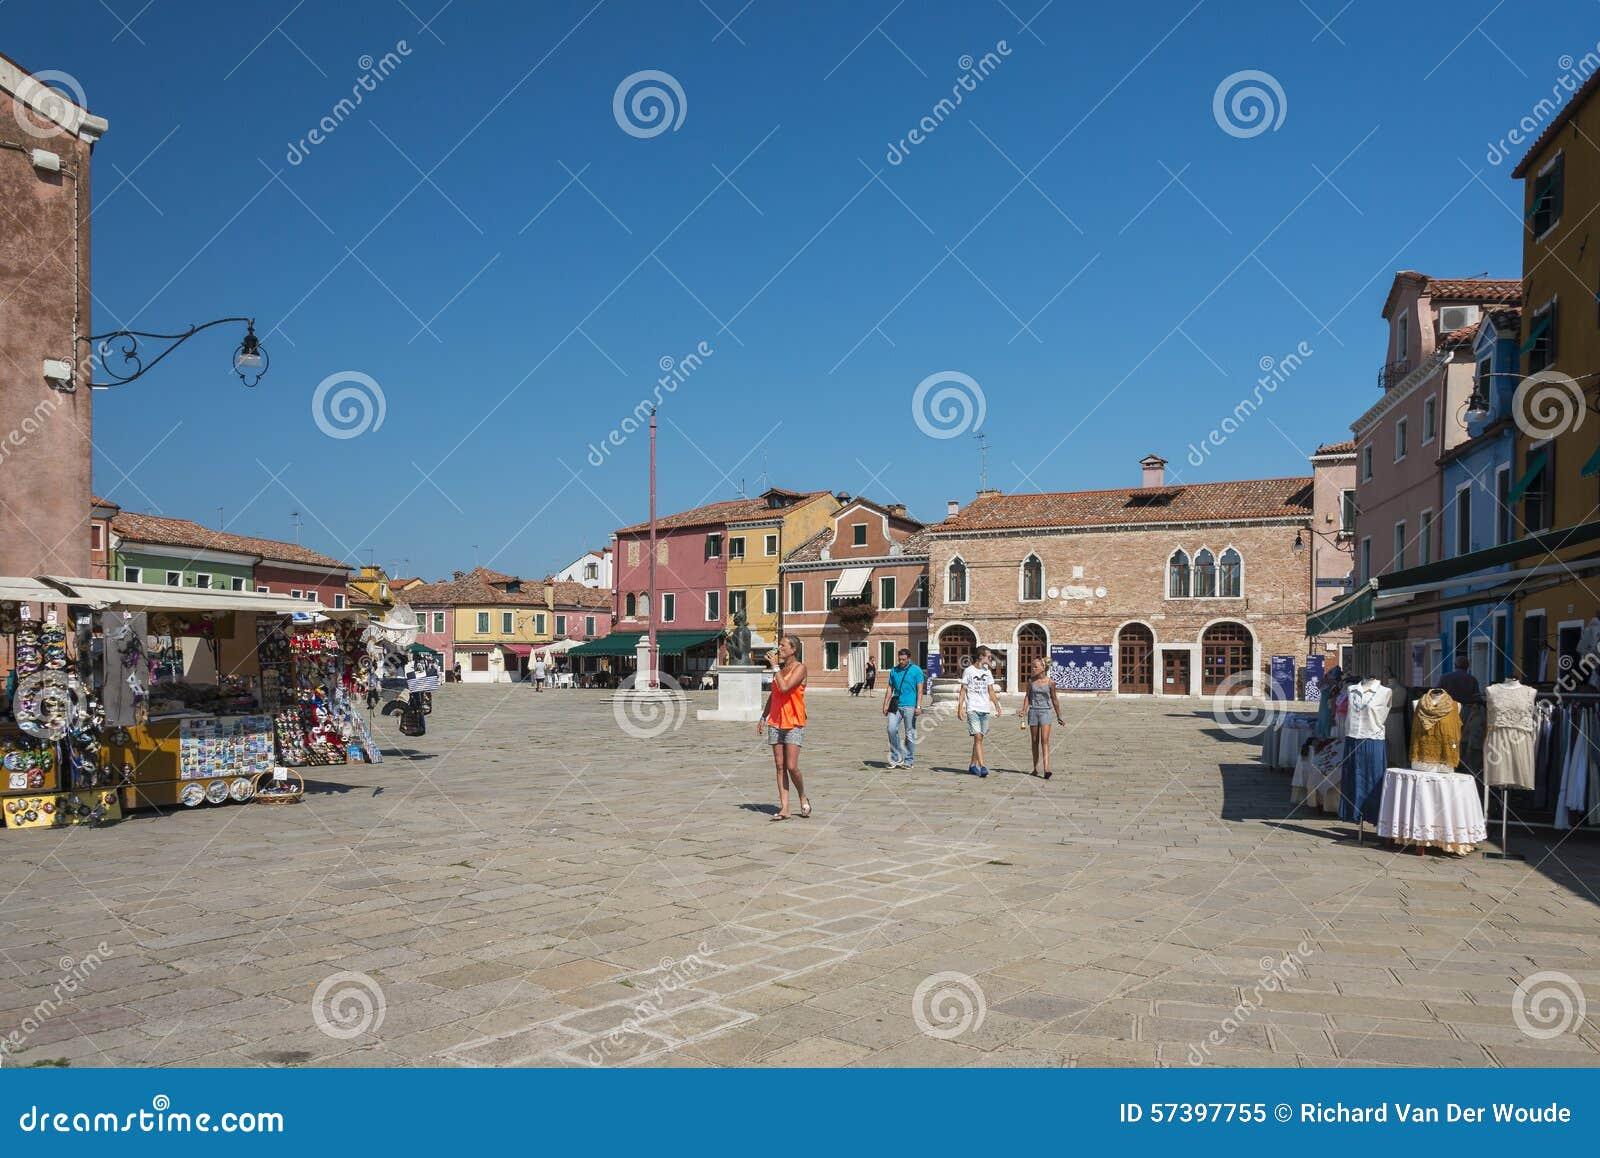 Burano, Venetië, Italië